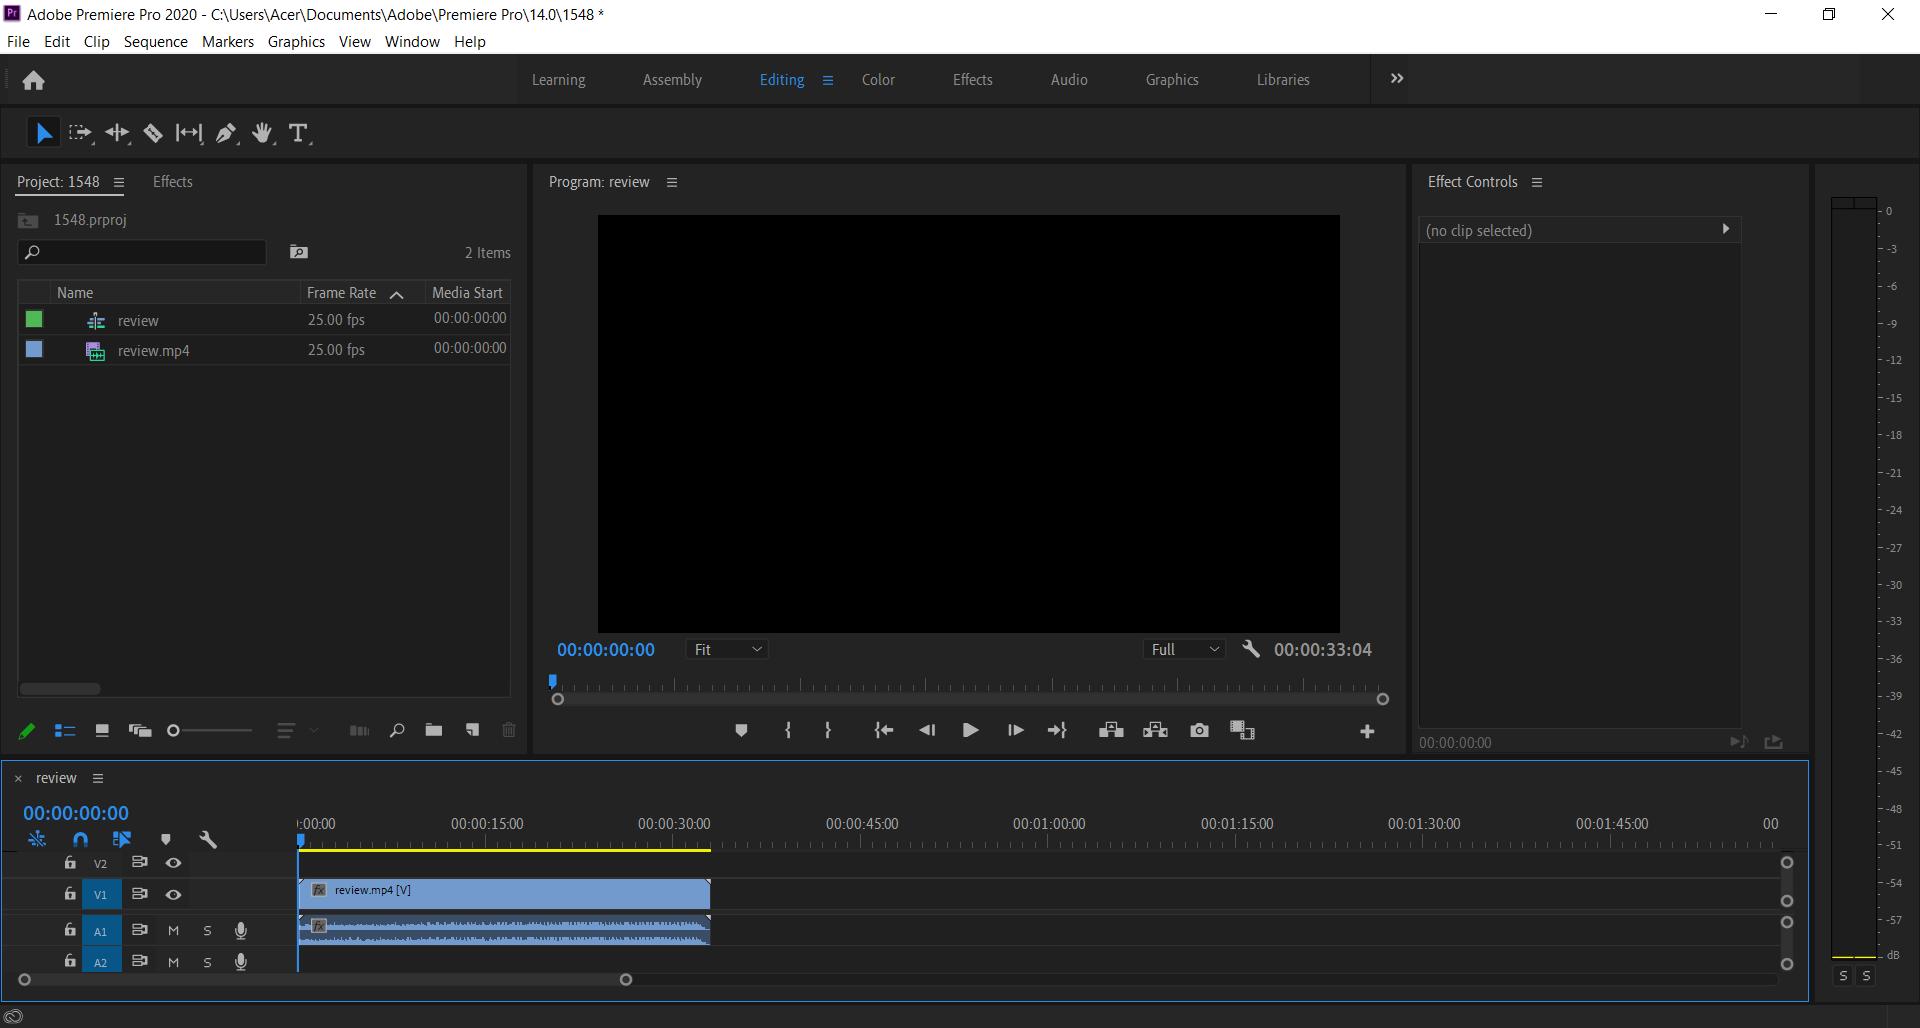 Video Editing Basics with Adobe Premiere Pro CC